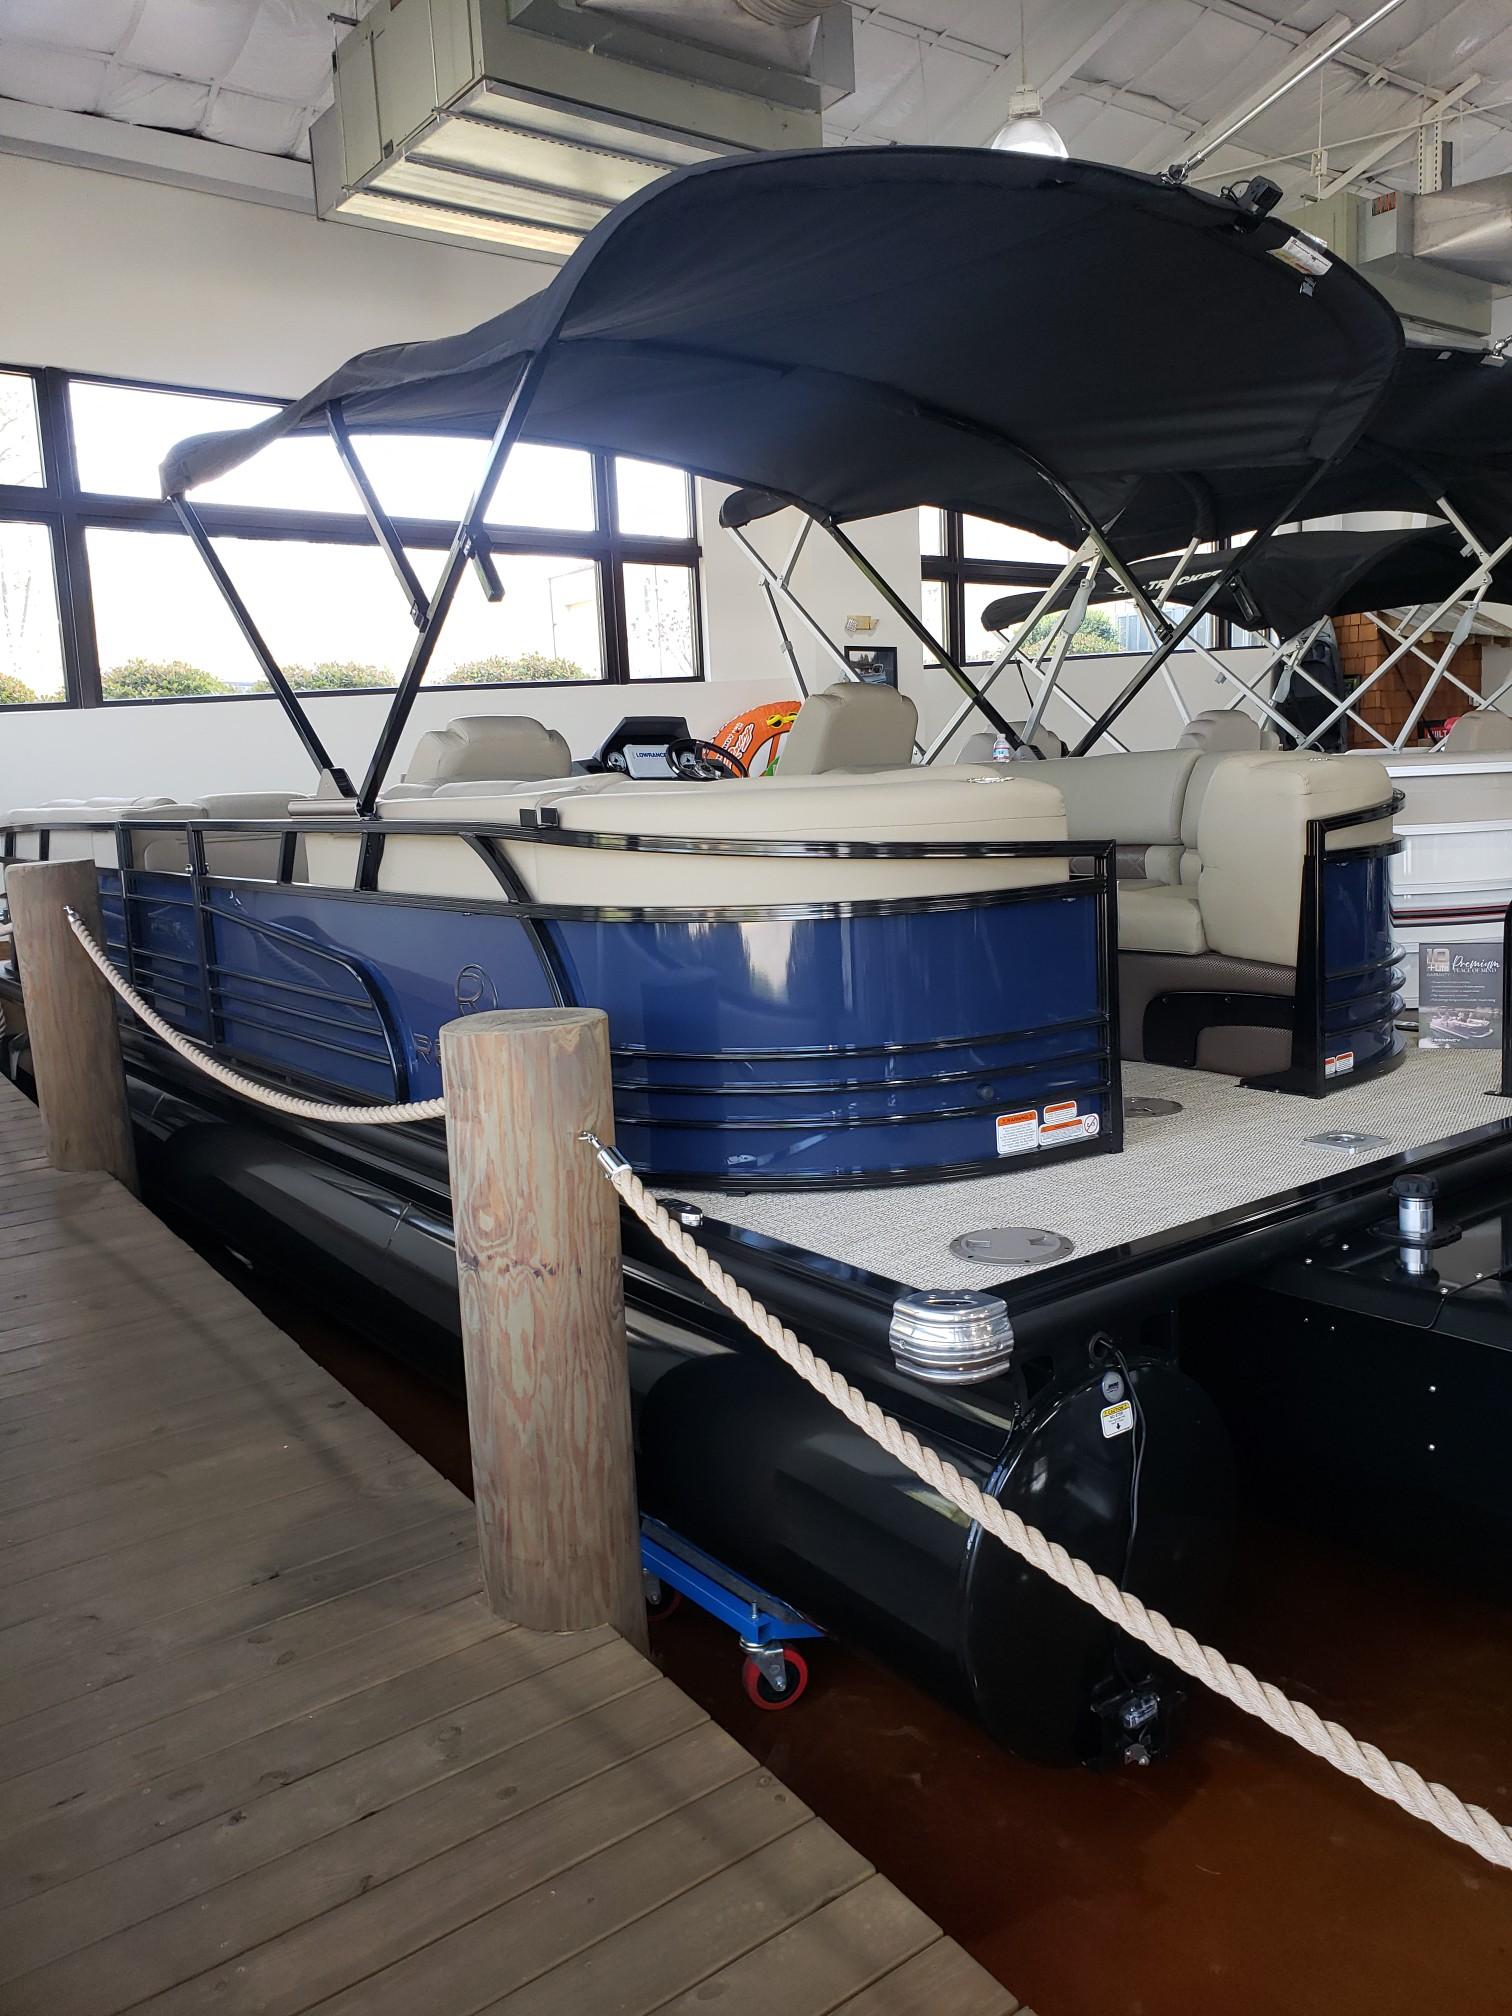 2020 Regency boat for sale, model of the boat is 250 LE3 w/300L Verado & Image # 14 of 27